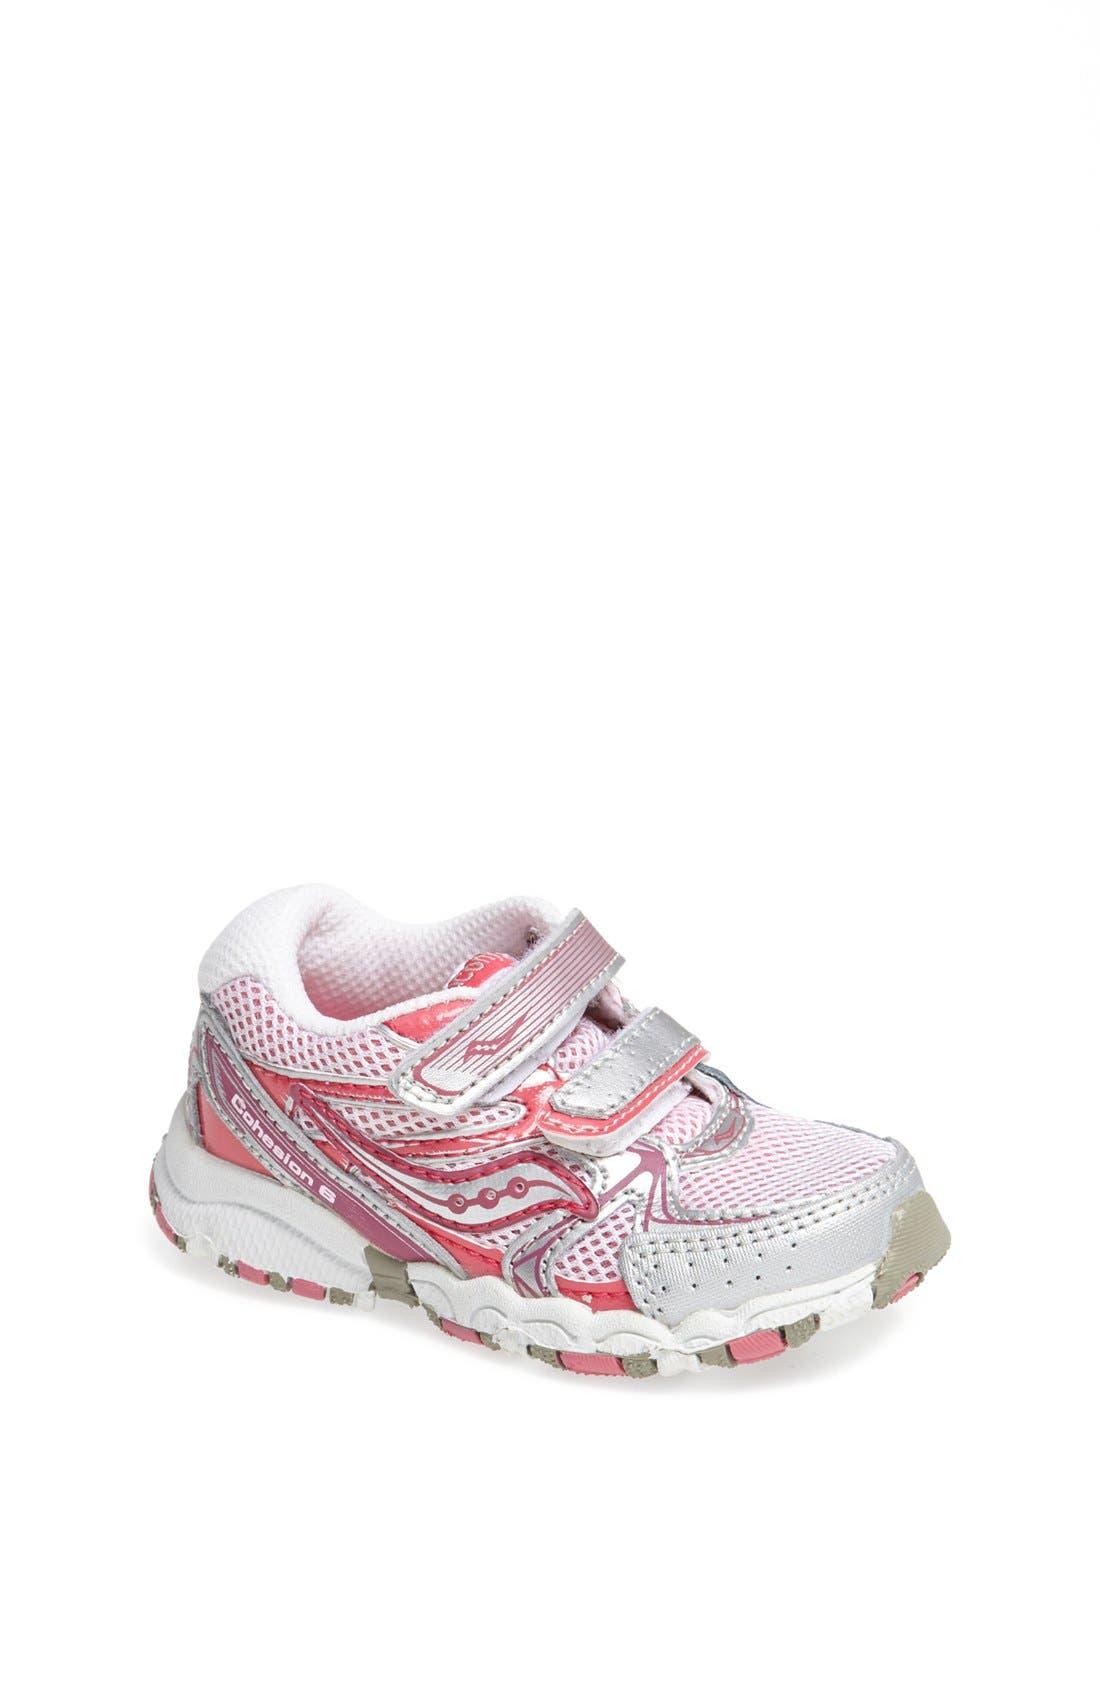 Alternate Image 1 Selected - Saucony 'Cohesion' Sneaker (Walker & Toddler)